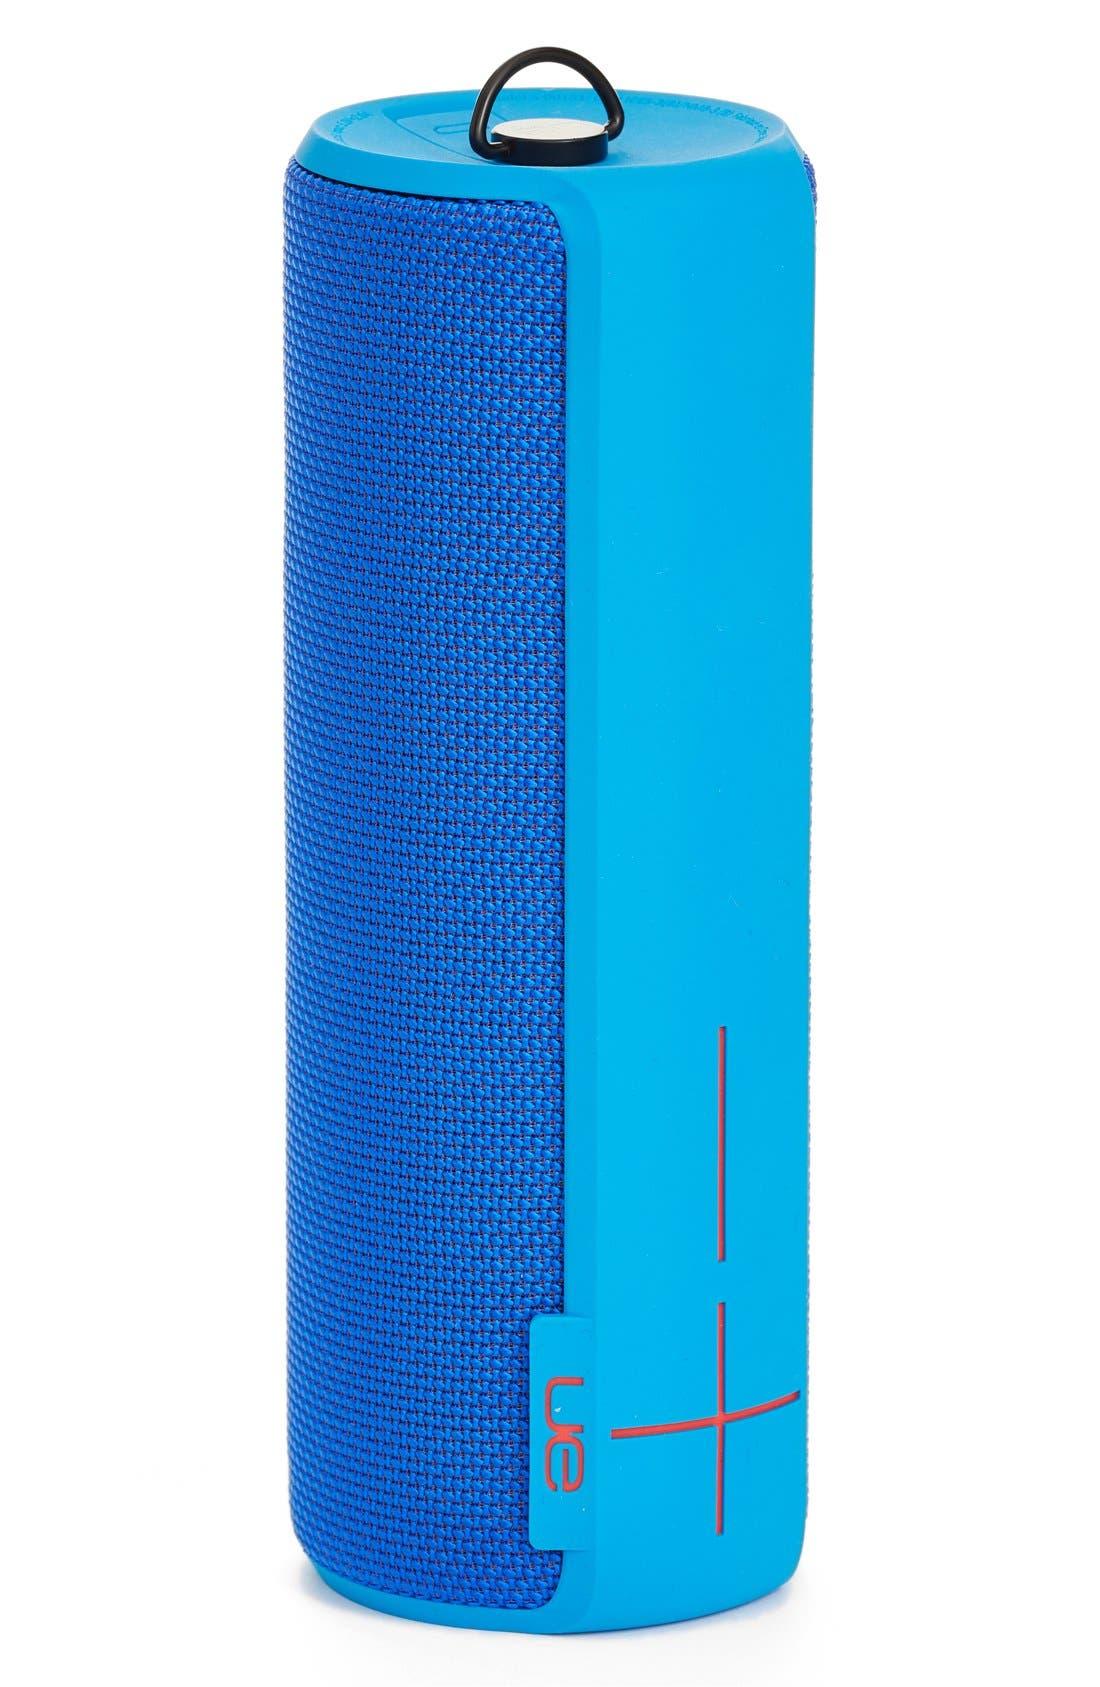 UE Boom 2 Wireless Bluetooth® Speaker